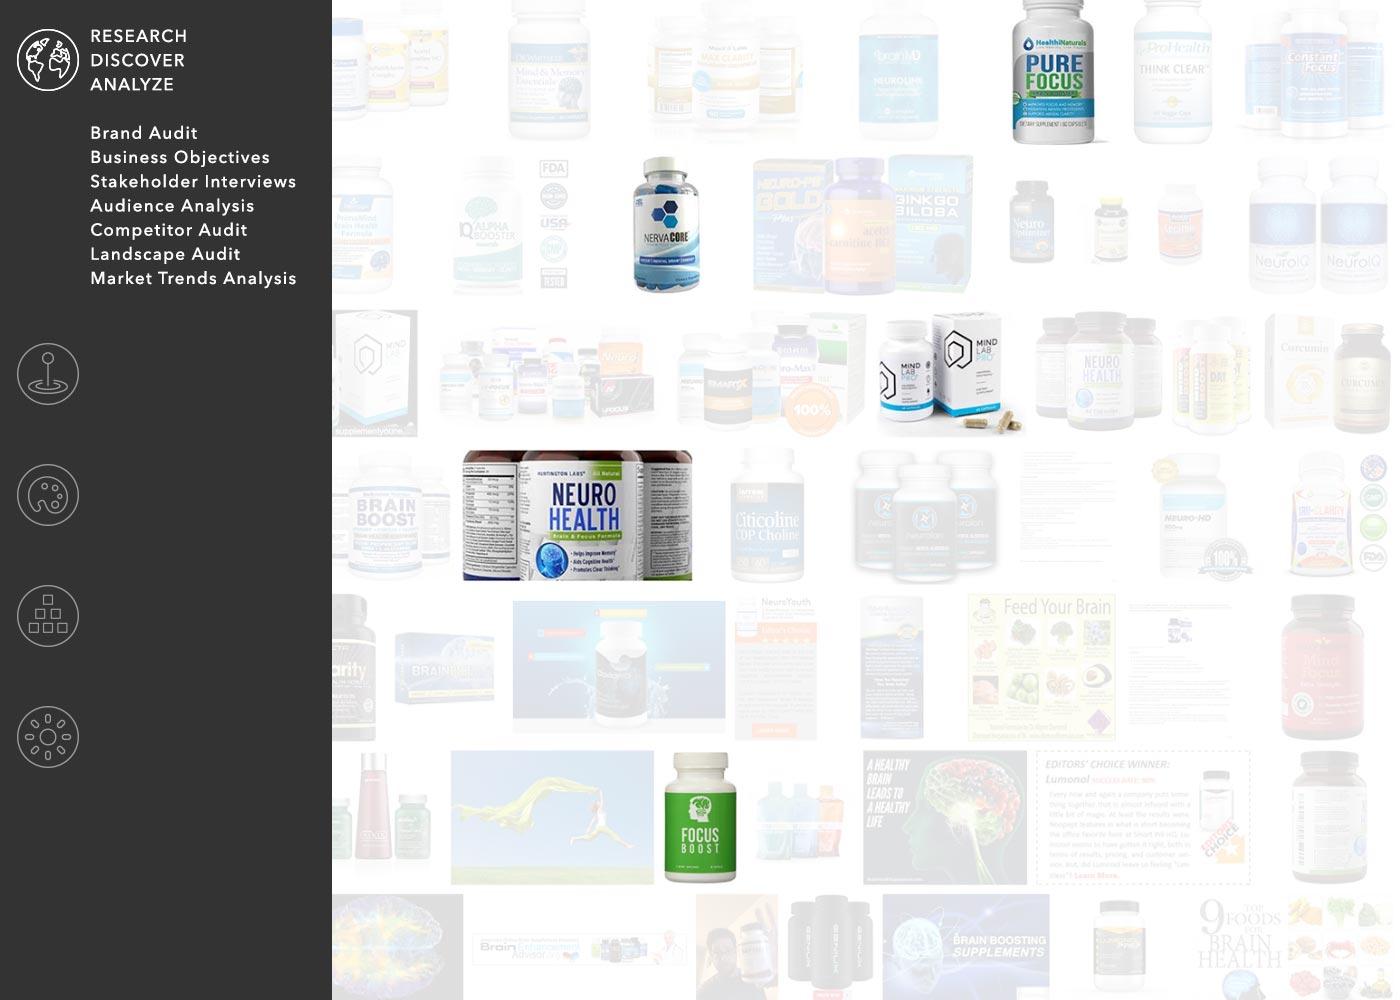 casestudy-banners-1400x1000-MN1.jpg